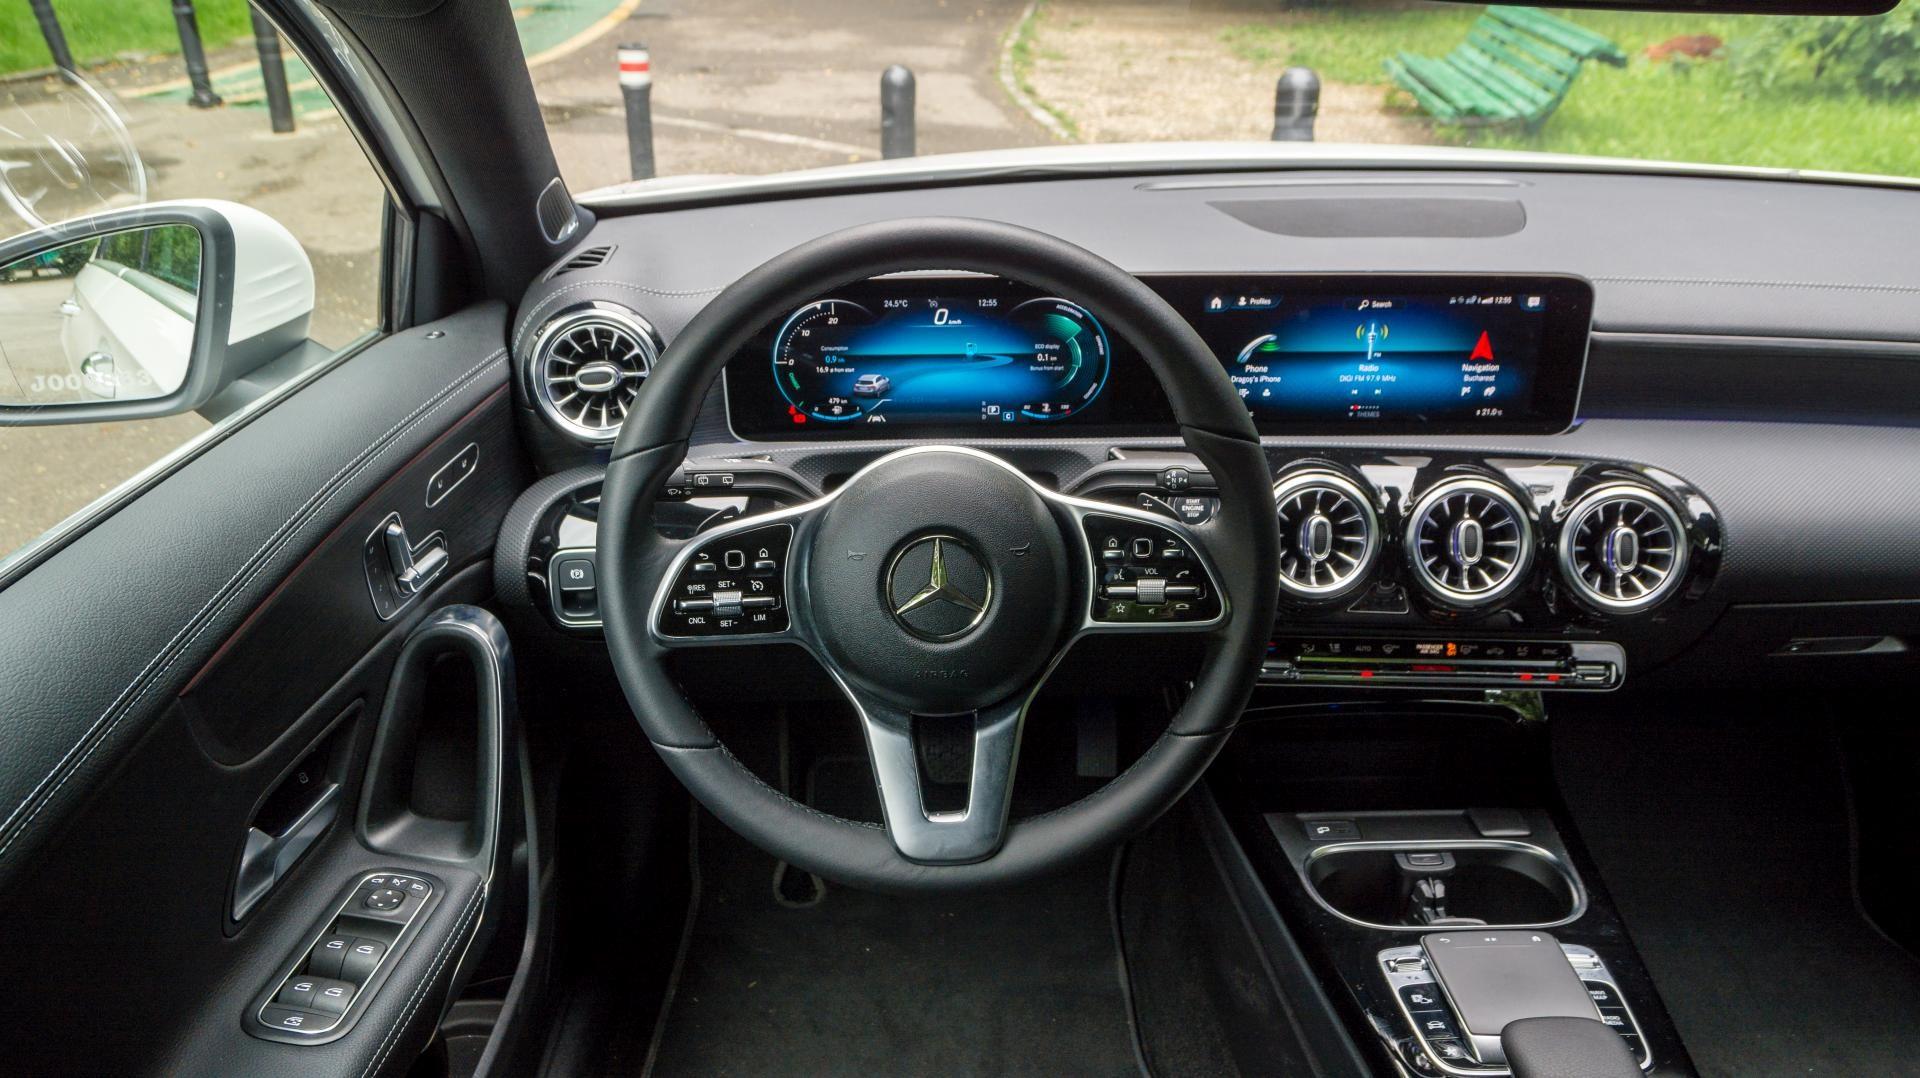 Mercedes-Benz A 200 design interior